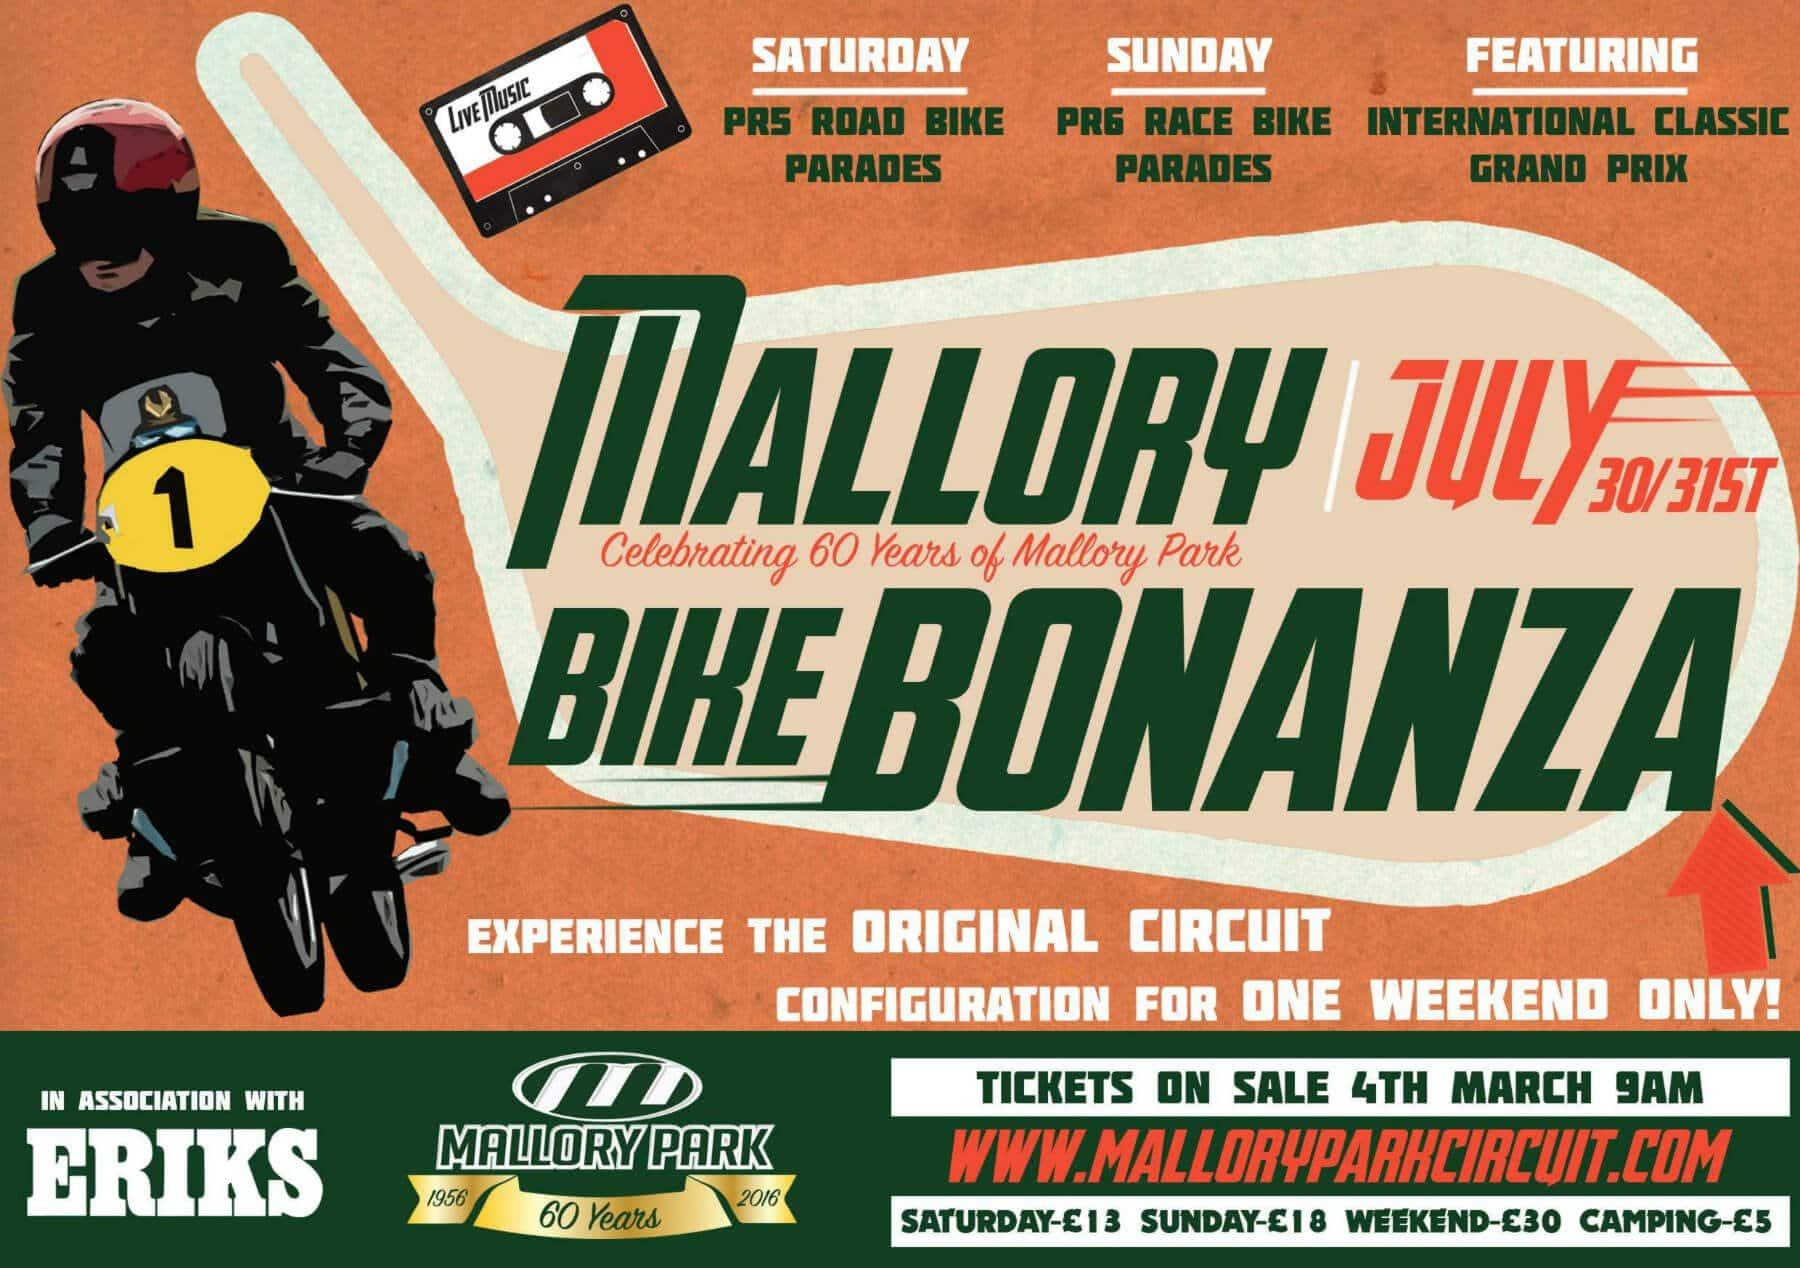 Mallory Park Bike Bonanza 2016